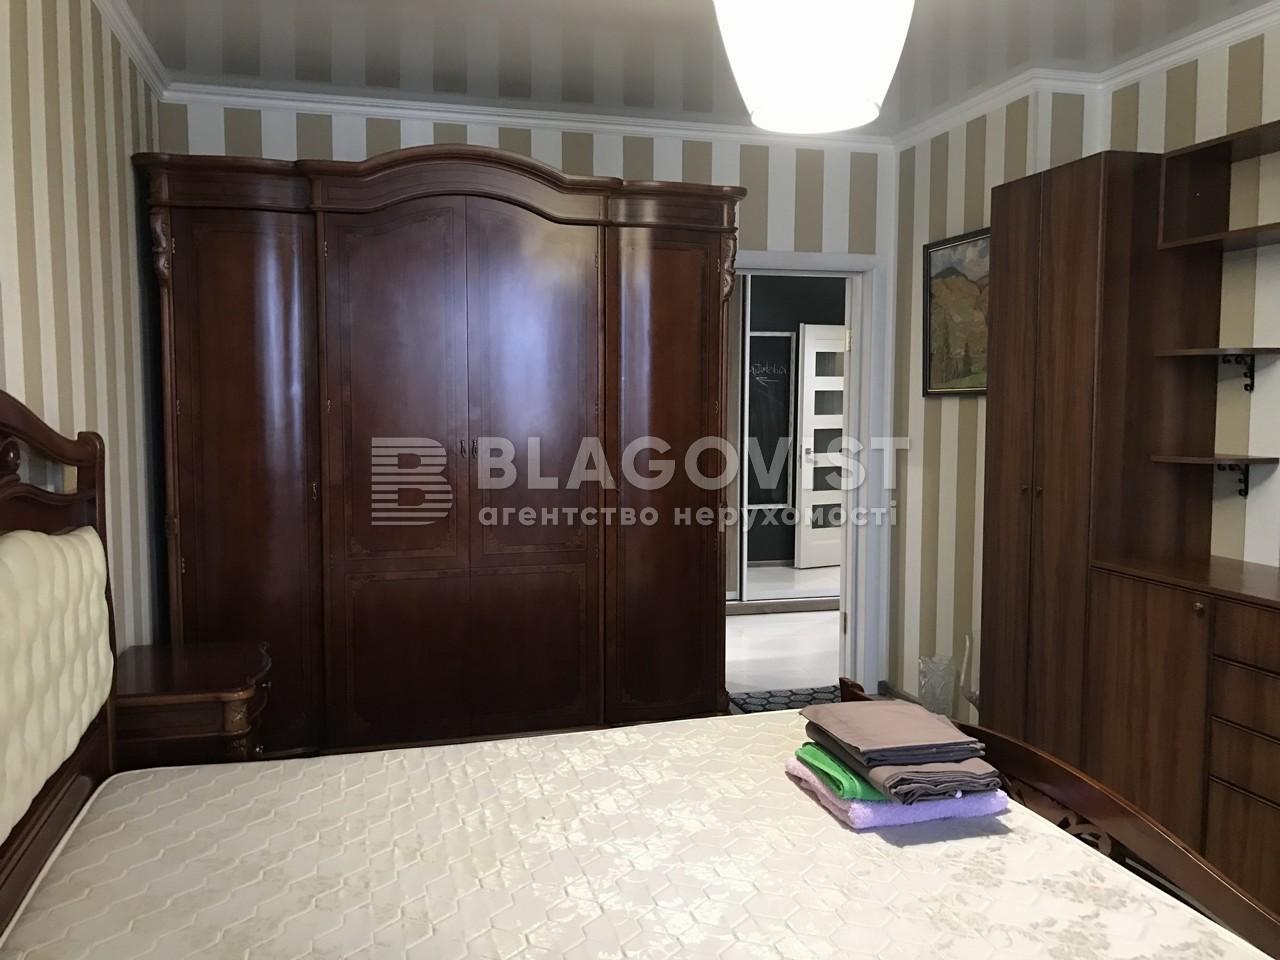 Квартира R-39864, Гришко Михаила, 9, Киев - Фото 9